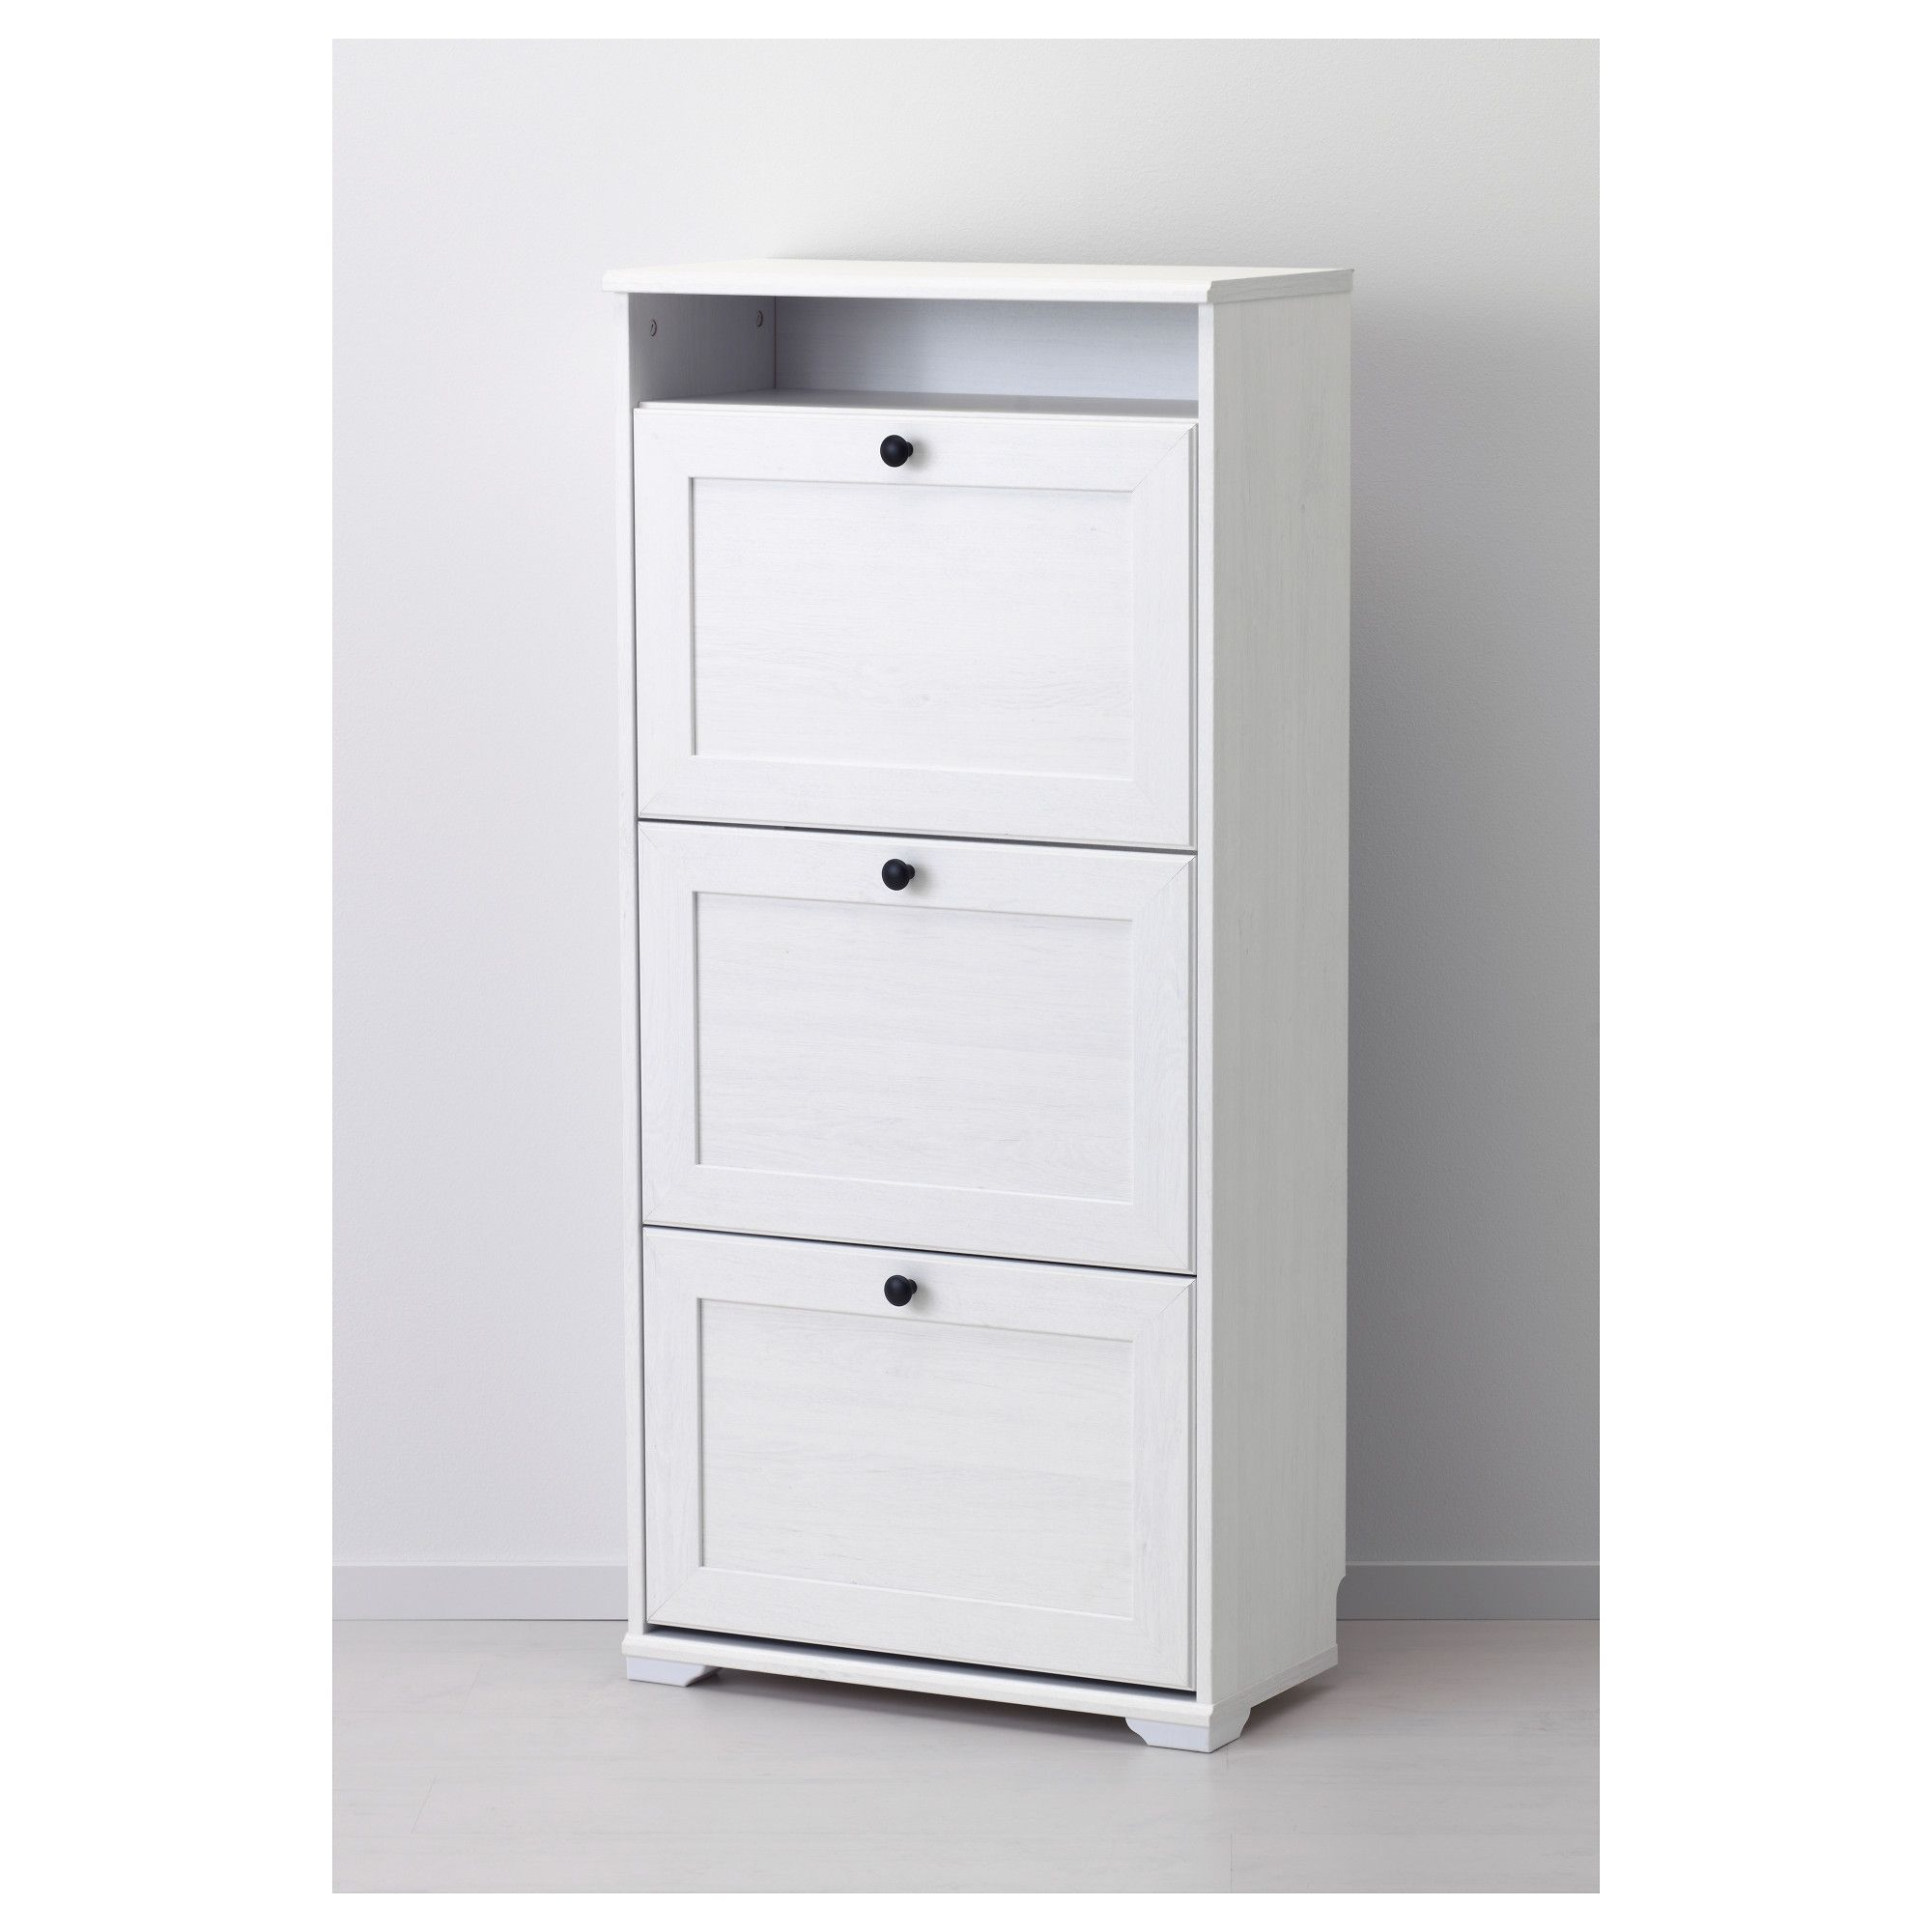 cabinet modern idea white finished storage furniture design stylish home ideas ikea shoe